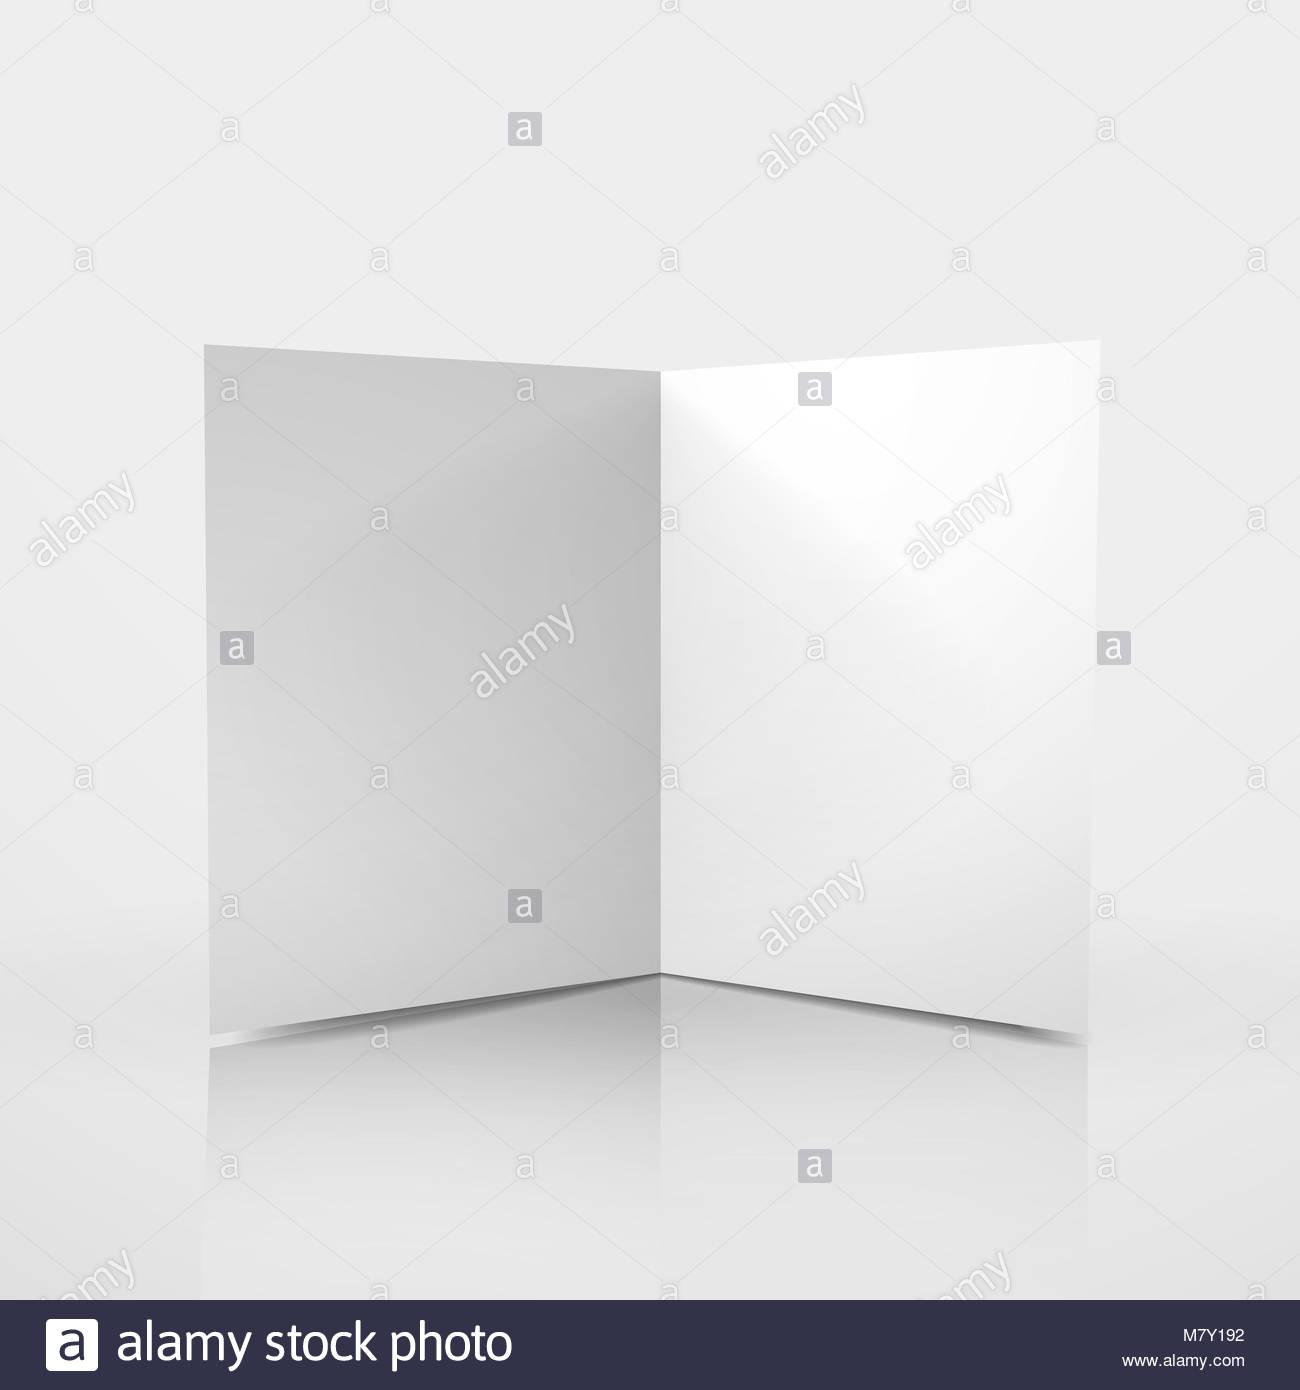 Fantastisch Modell Z Kartenvorlage Bilder - Entry Level Resume ...